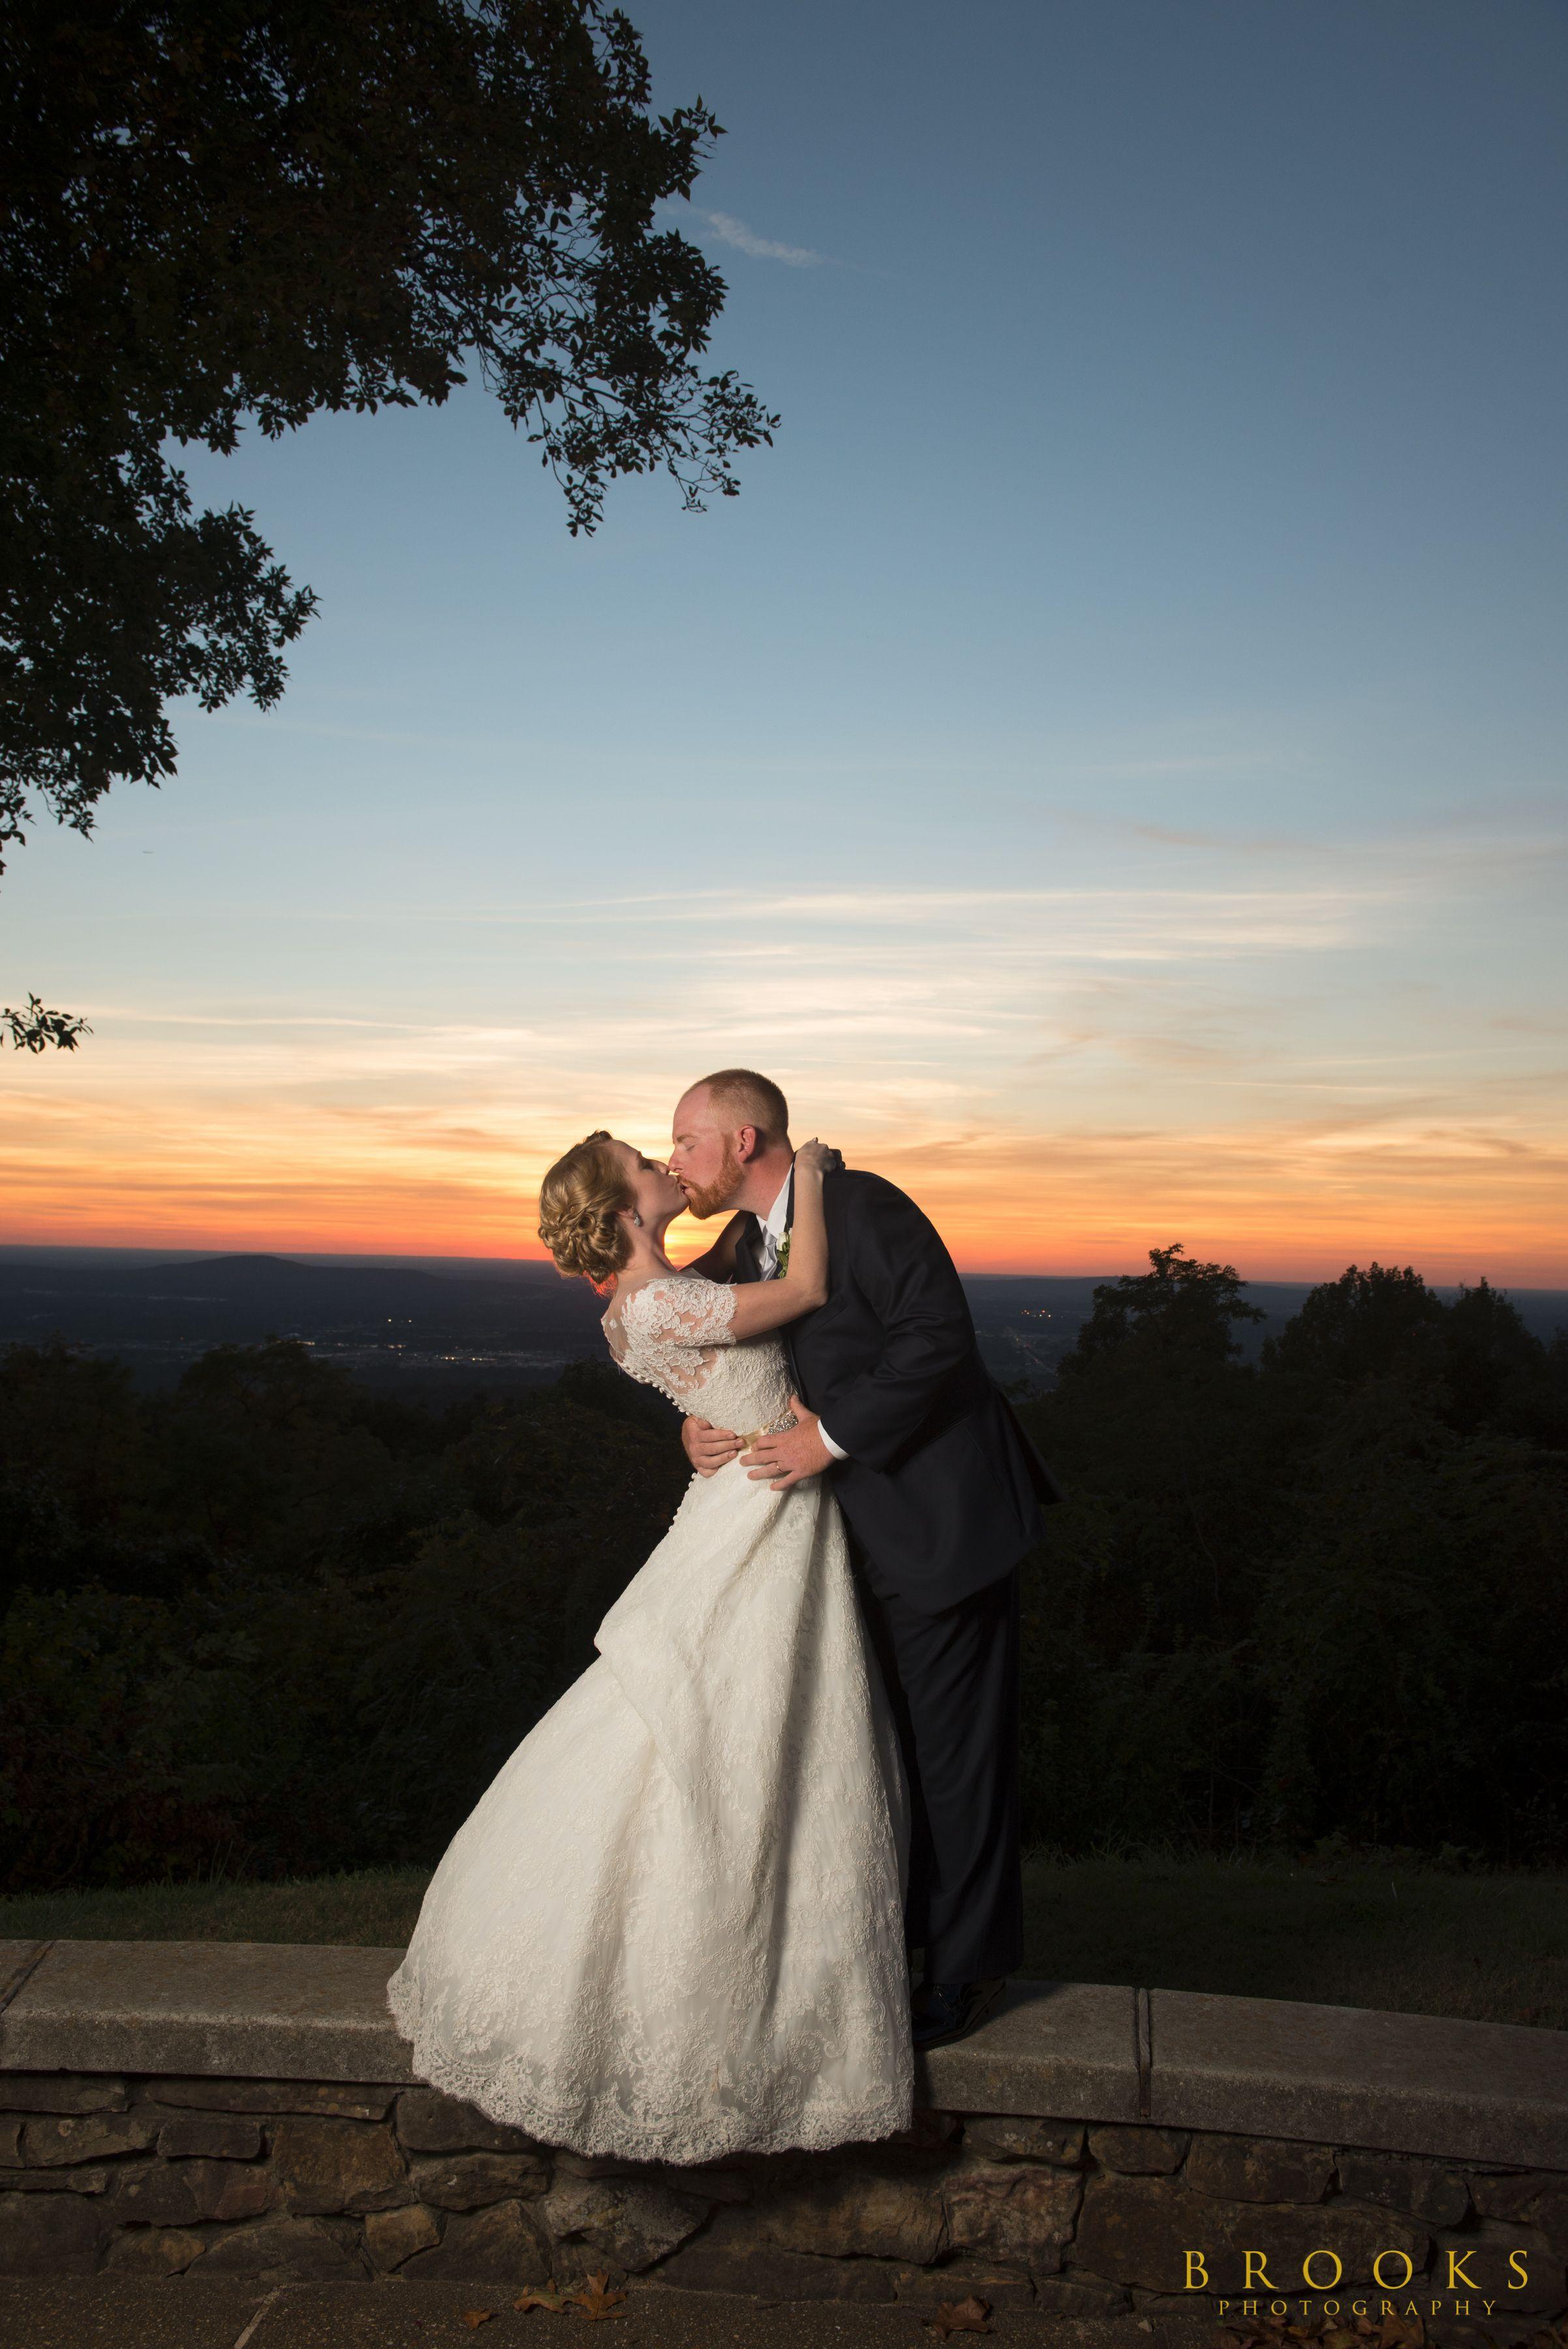 Wedding dress huntsville al  Bride u Groom at Sunset at Burritt on the Mountain in Huntsville AL